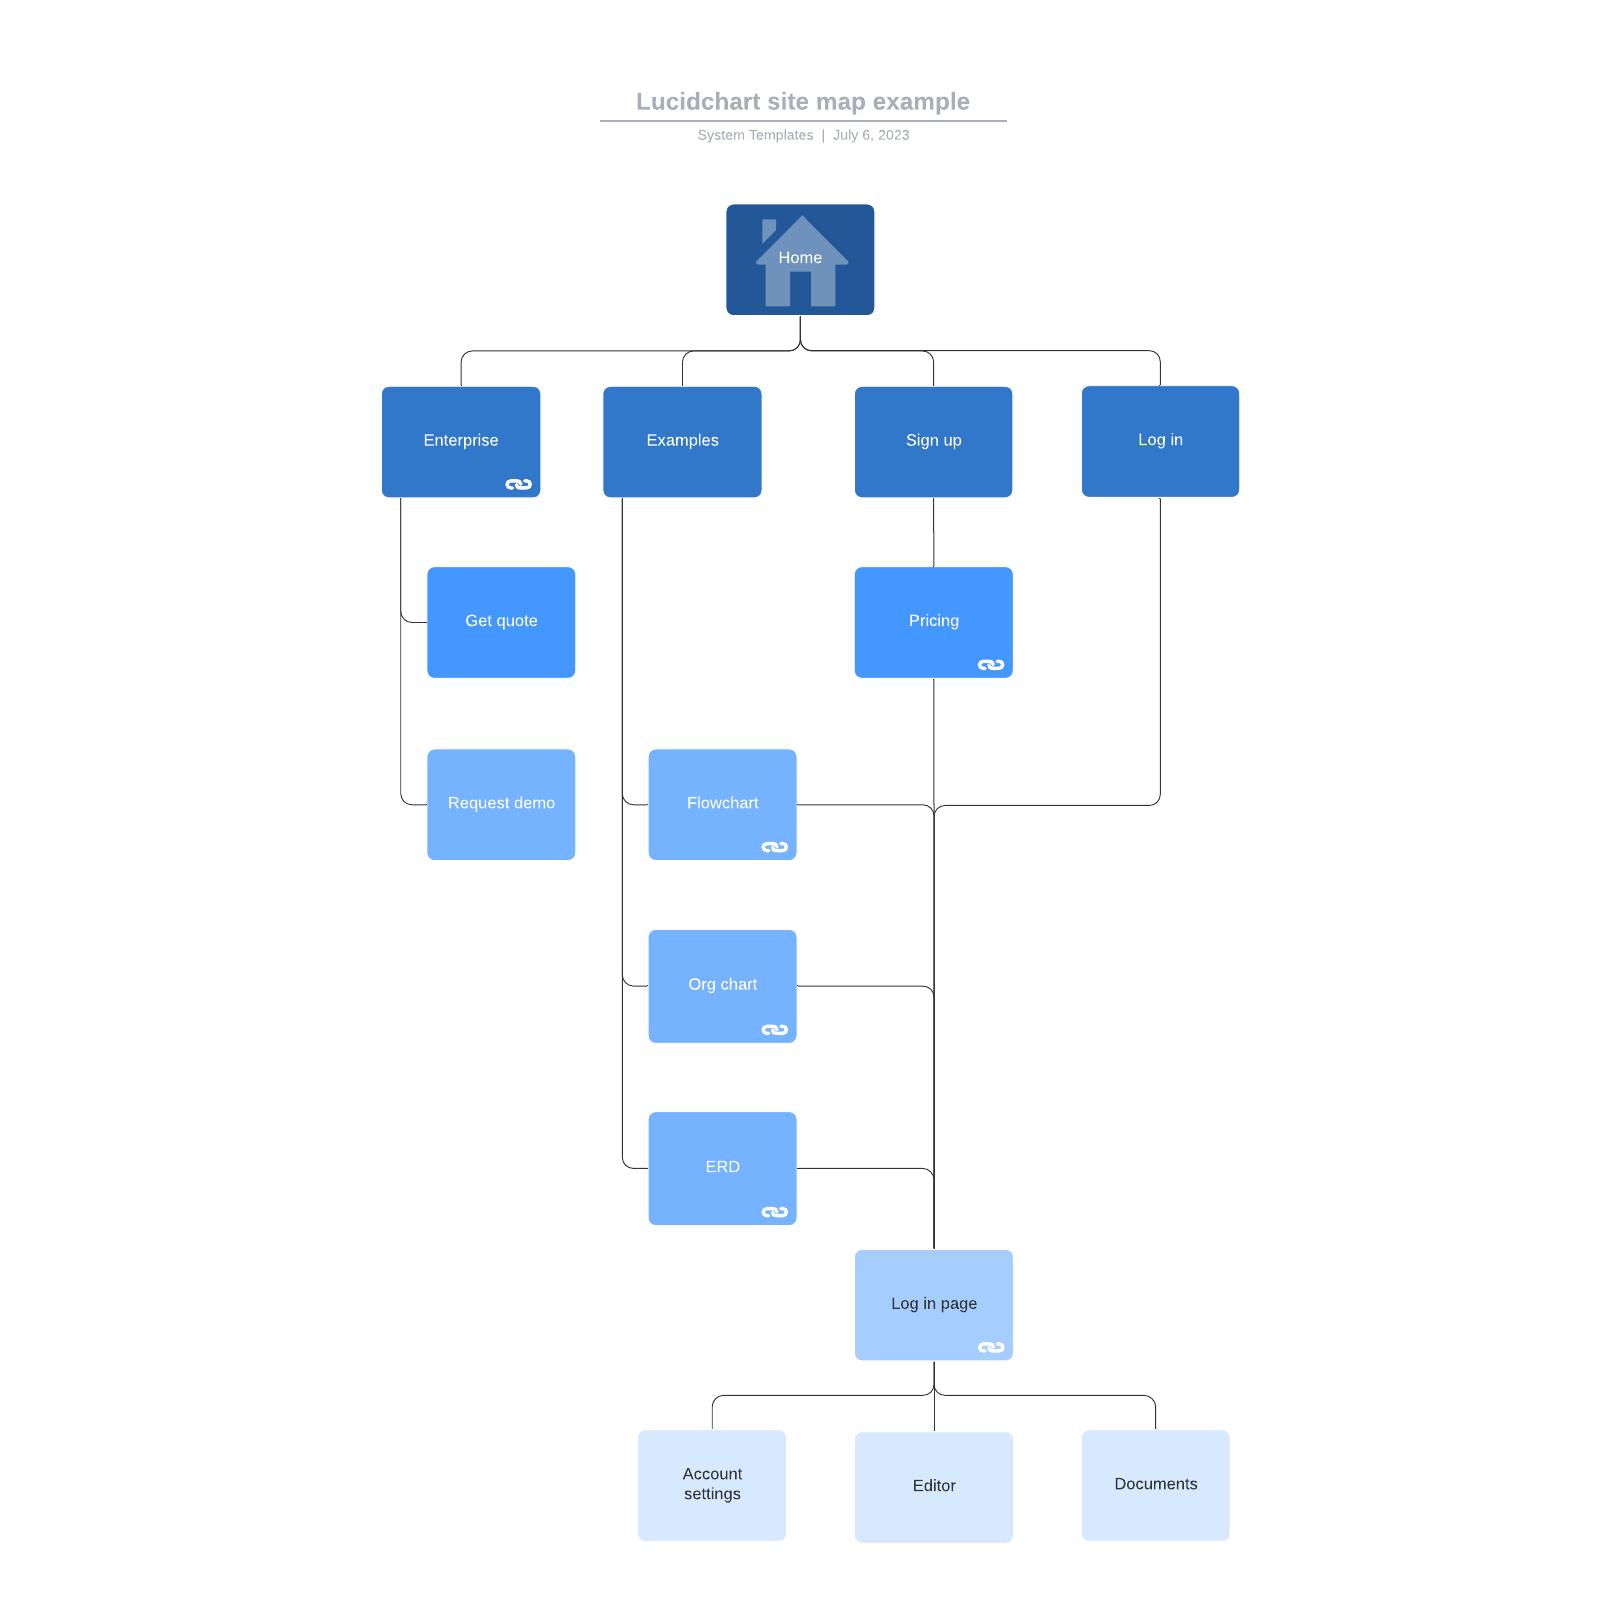 Lucidchart site map example